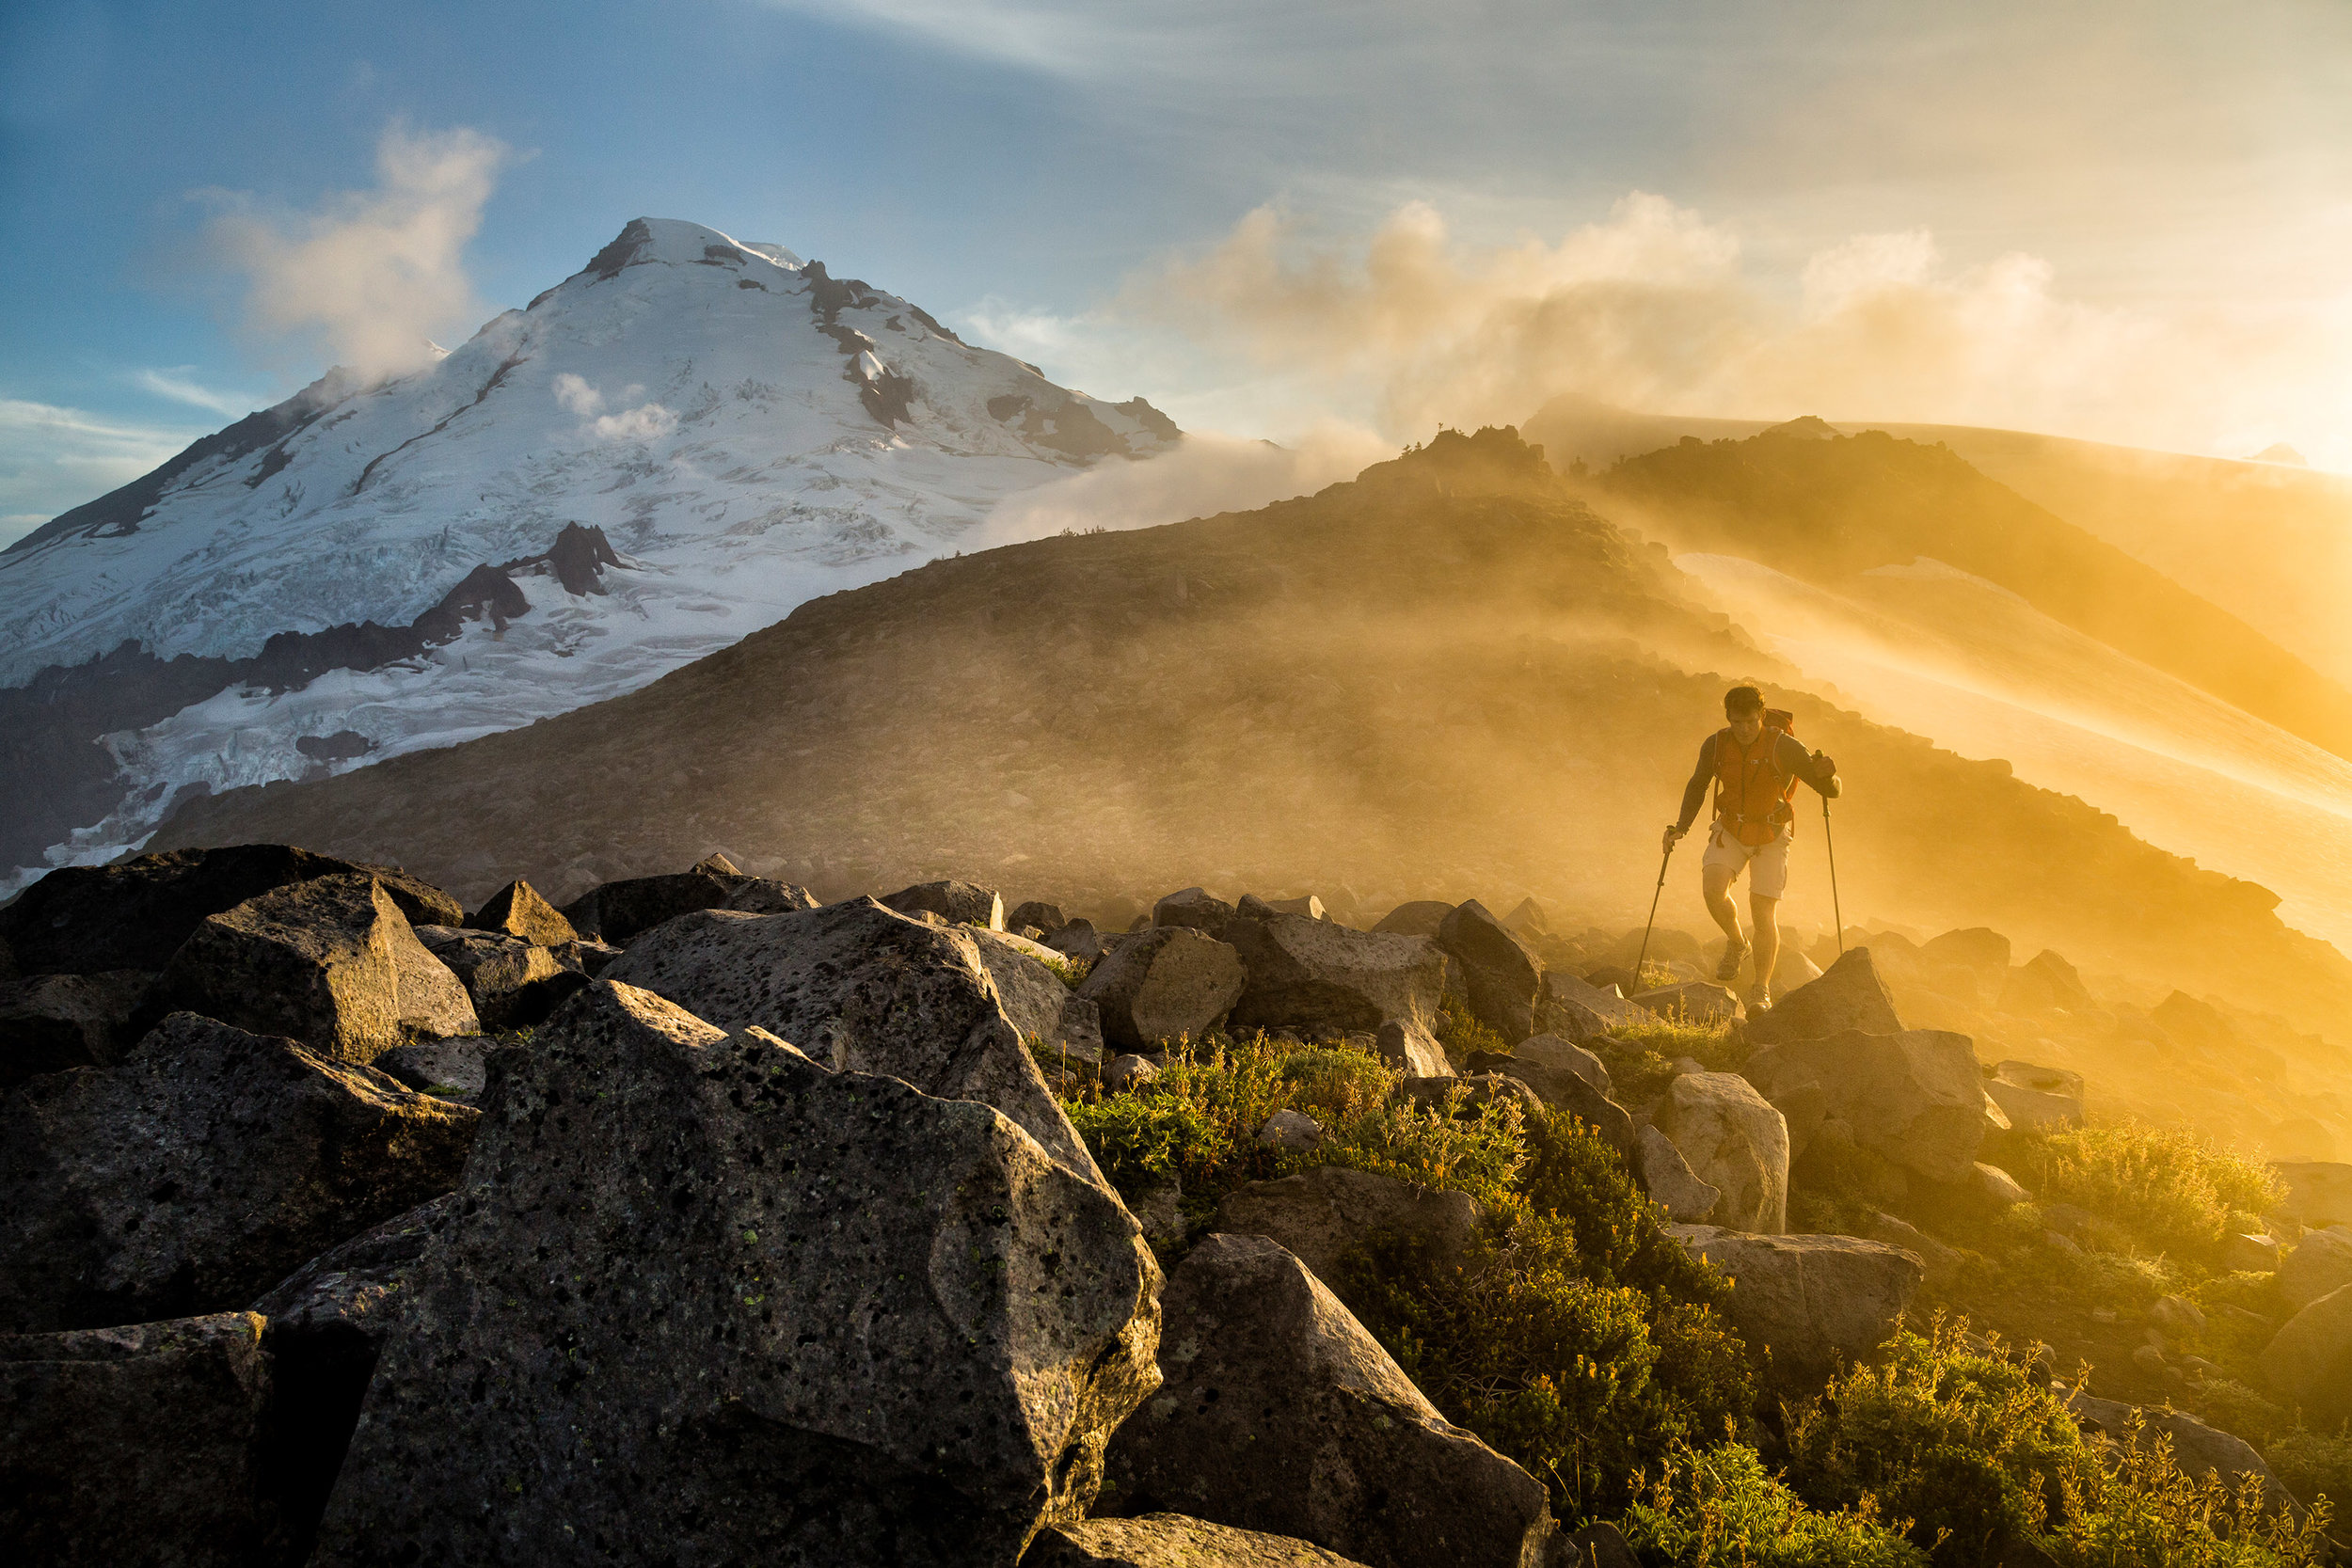 Adventure: Michael Hildebrand hiking through fog at sunset below Mt. Baker, Mt. Baker Wilderness, Washington